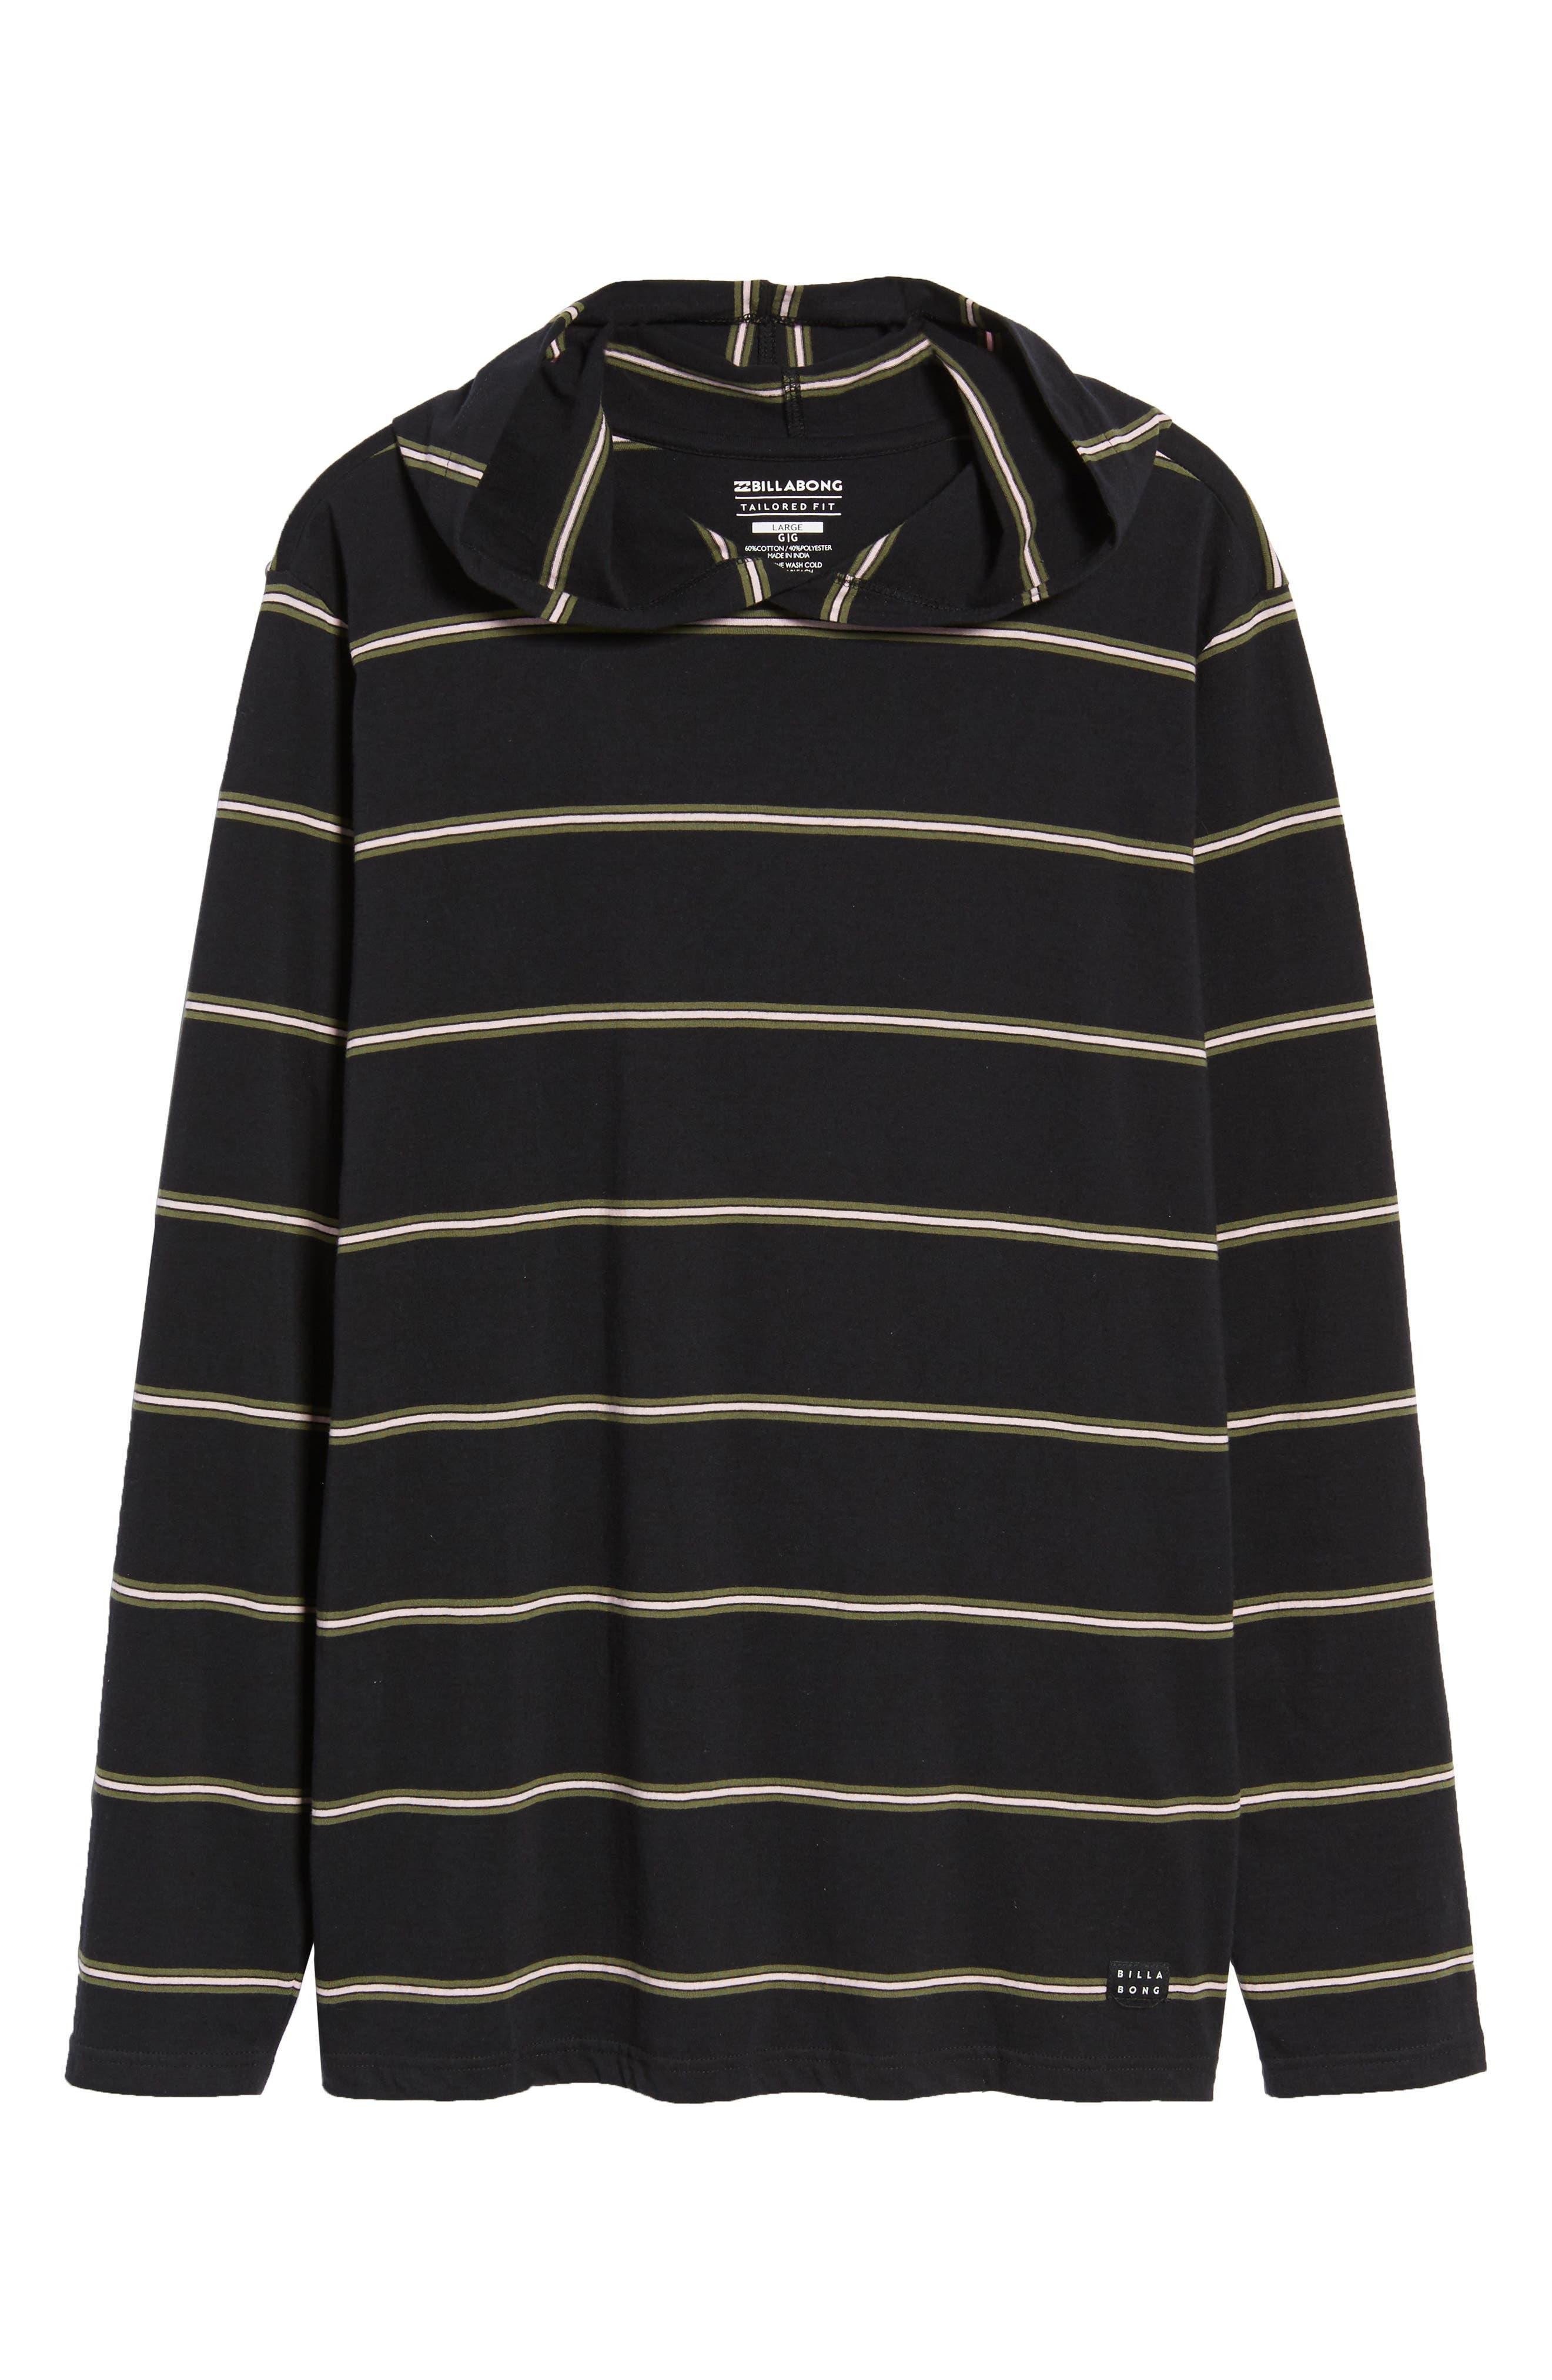 Die Cut Hooded Long Sleeve T-Shirt,                             Alternate thumbnail 6, color,                             001